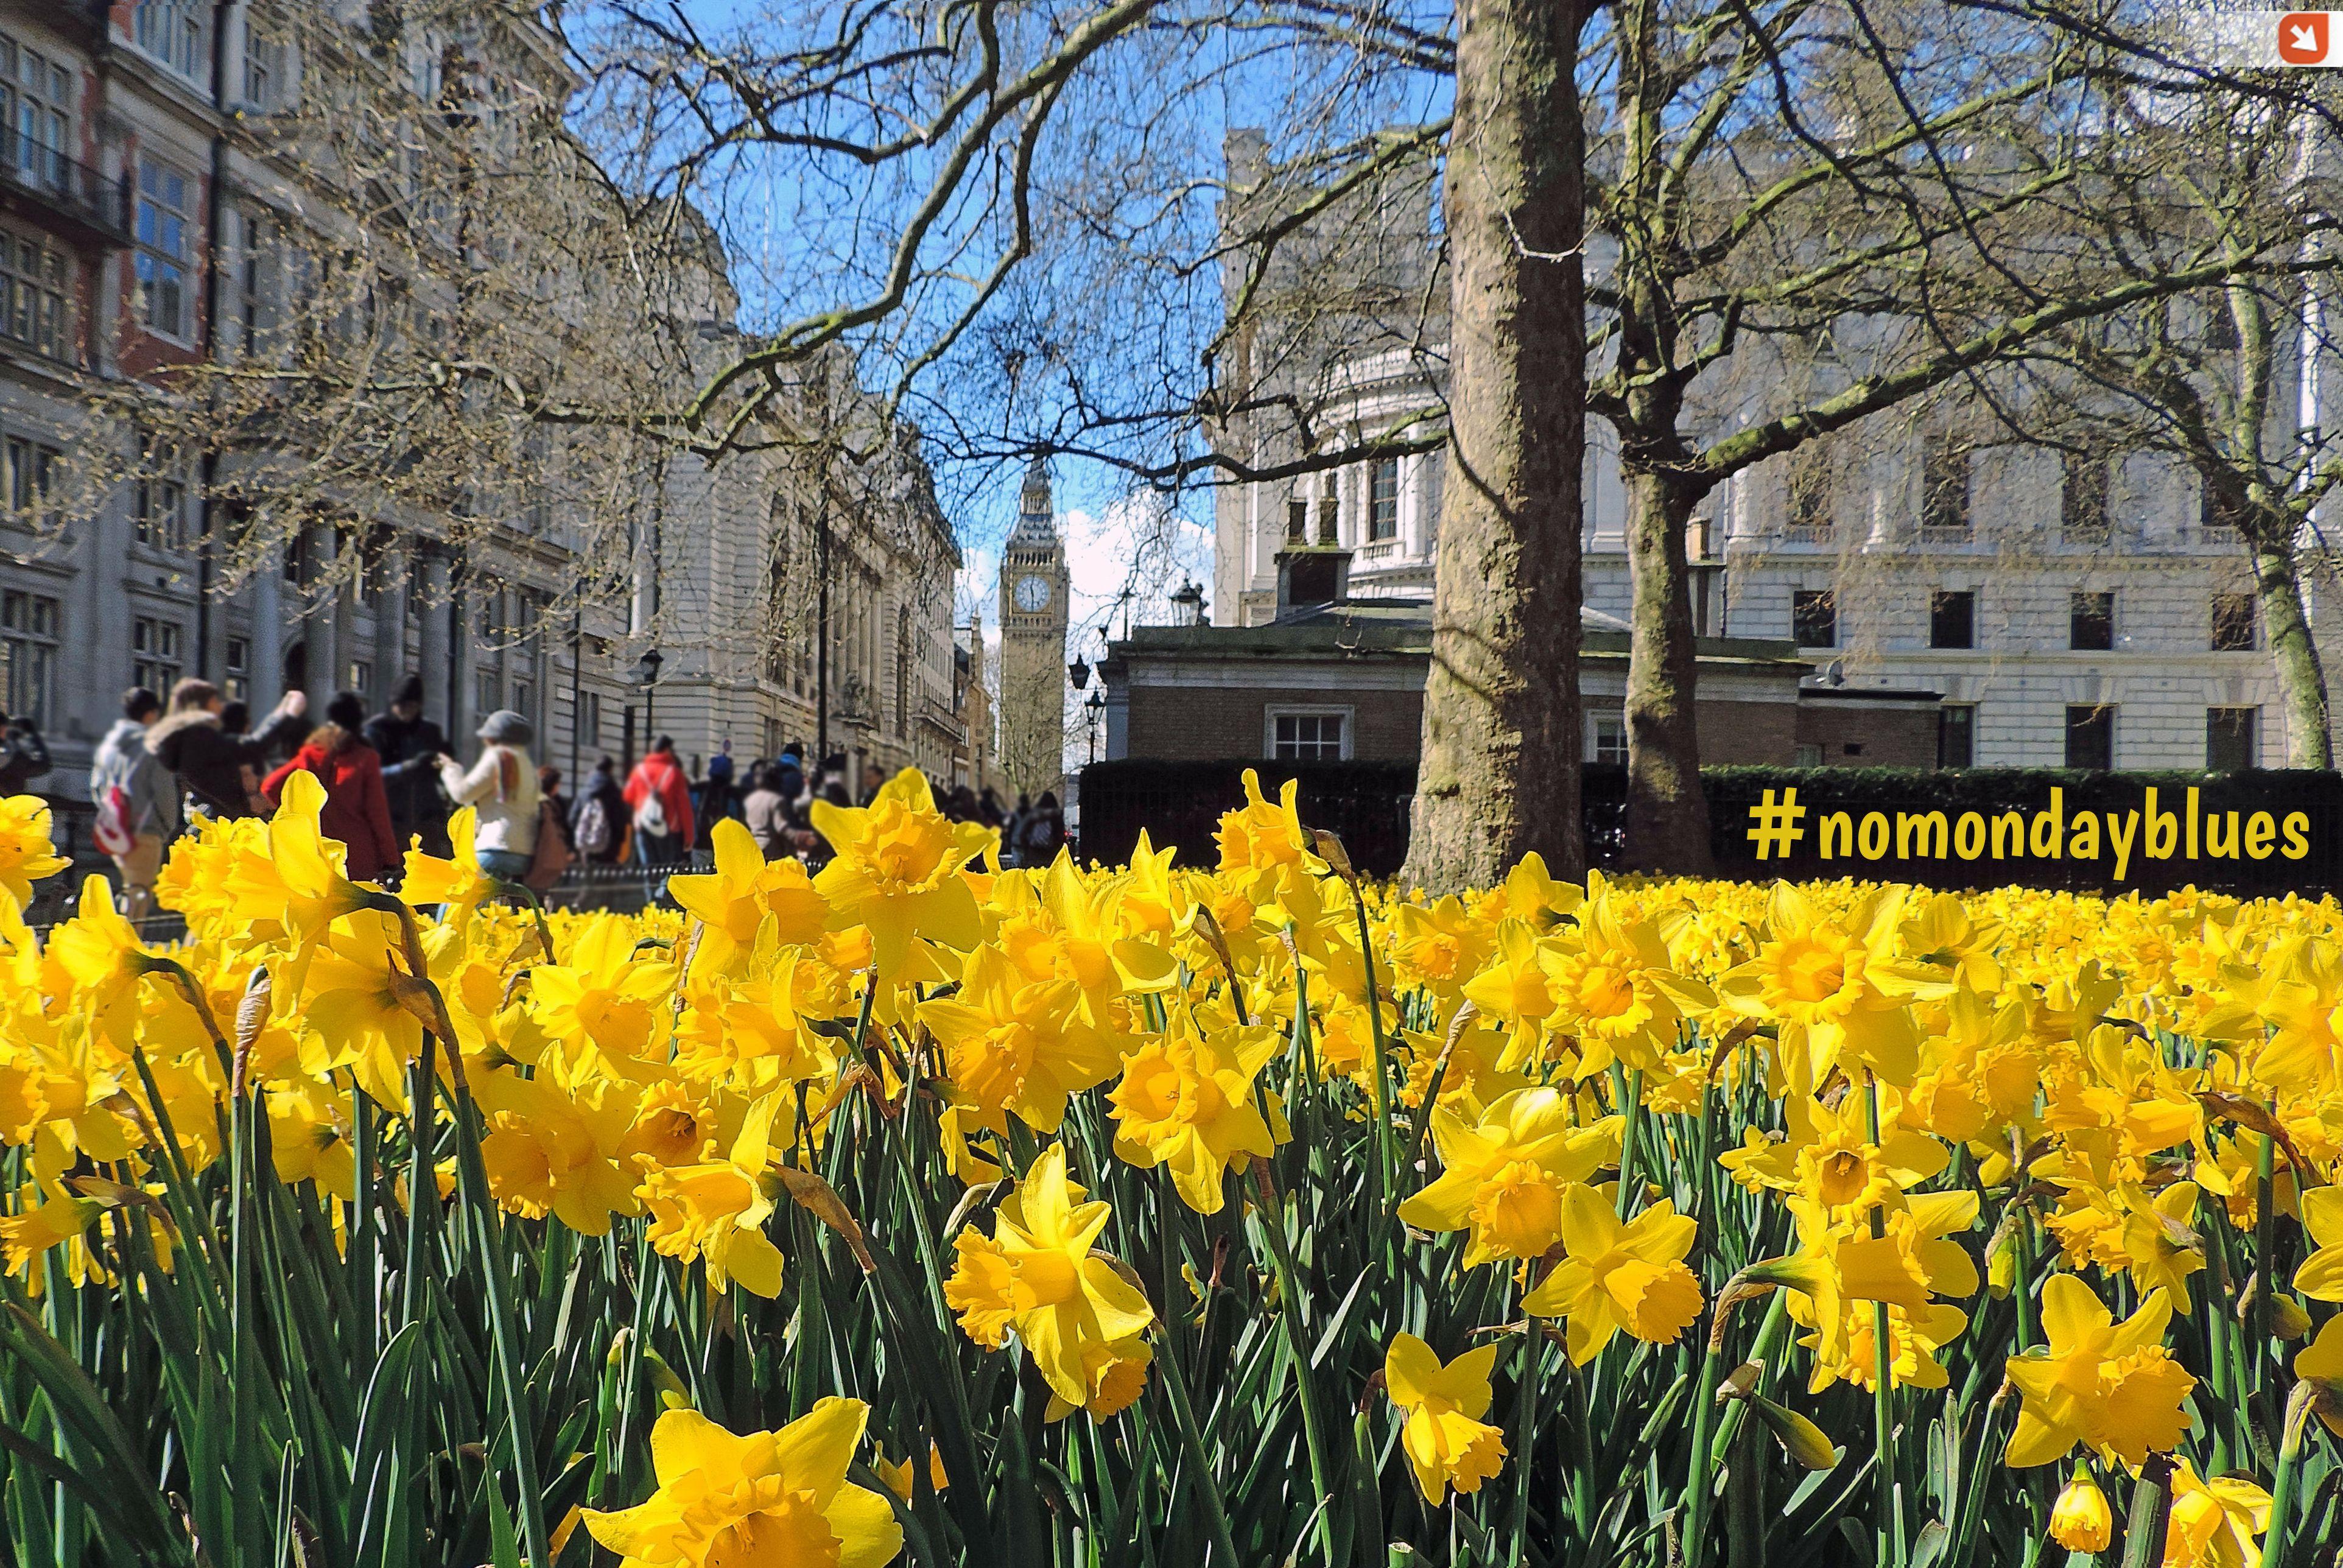 Who would like to take a trip to #London to fight against Mondays syndrome? #nomondayblues #mondayblues